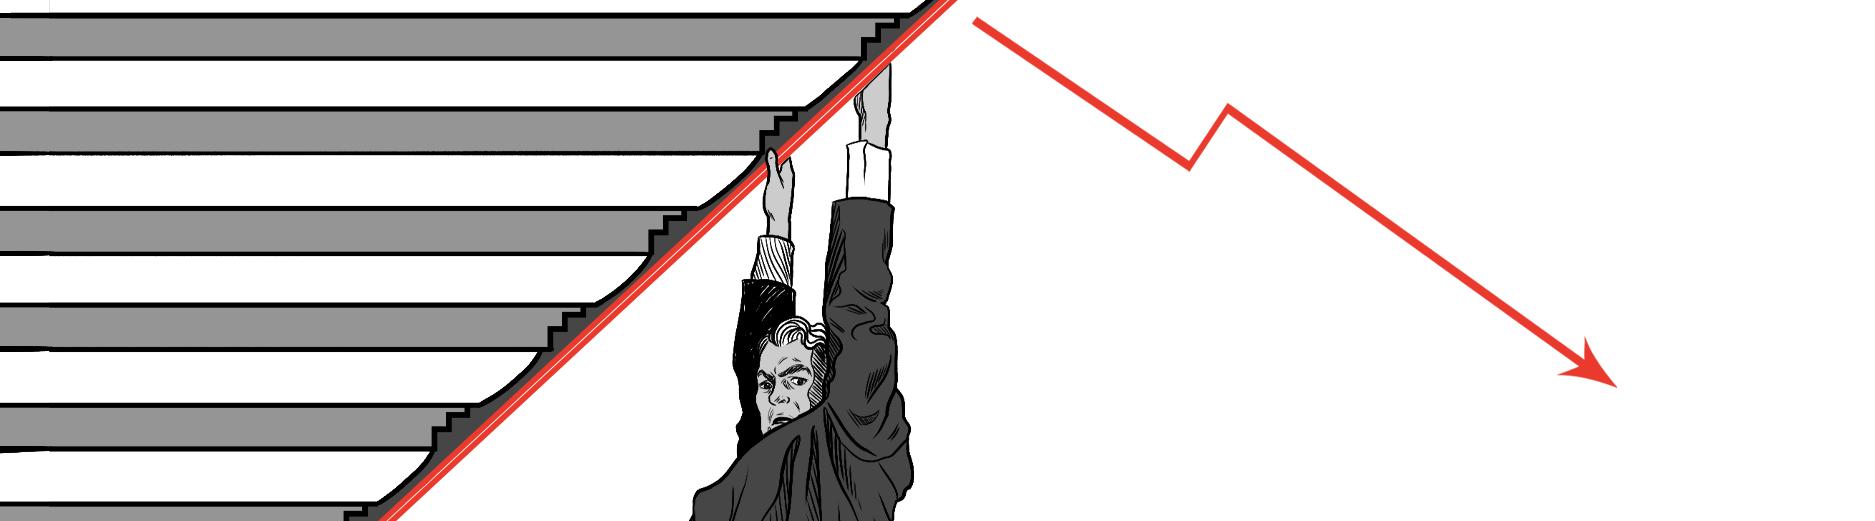 Top 10 financial bubbles & panics